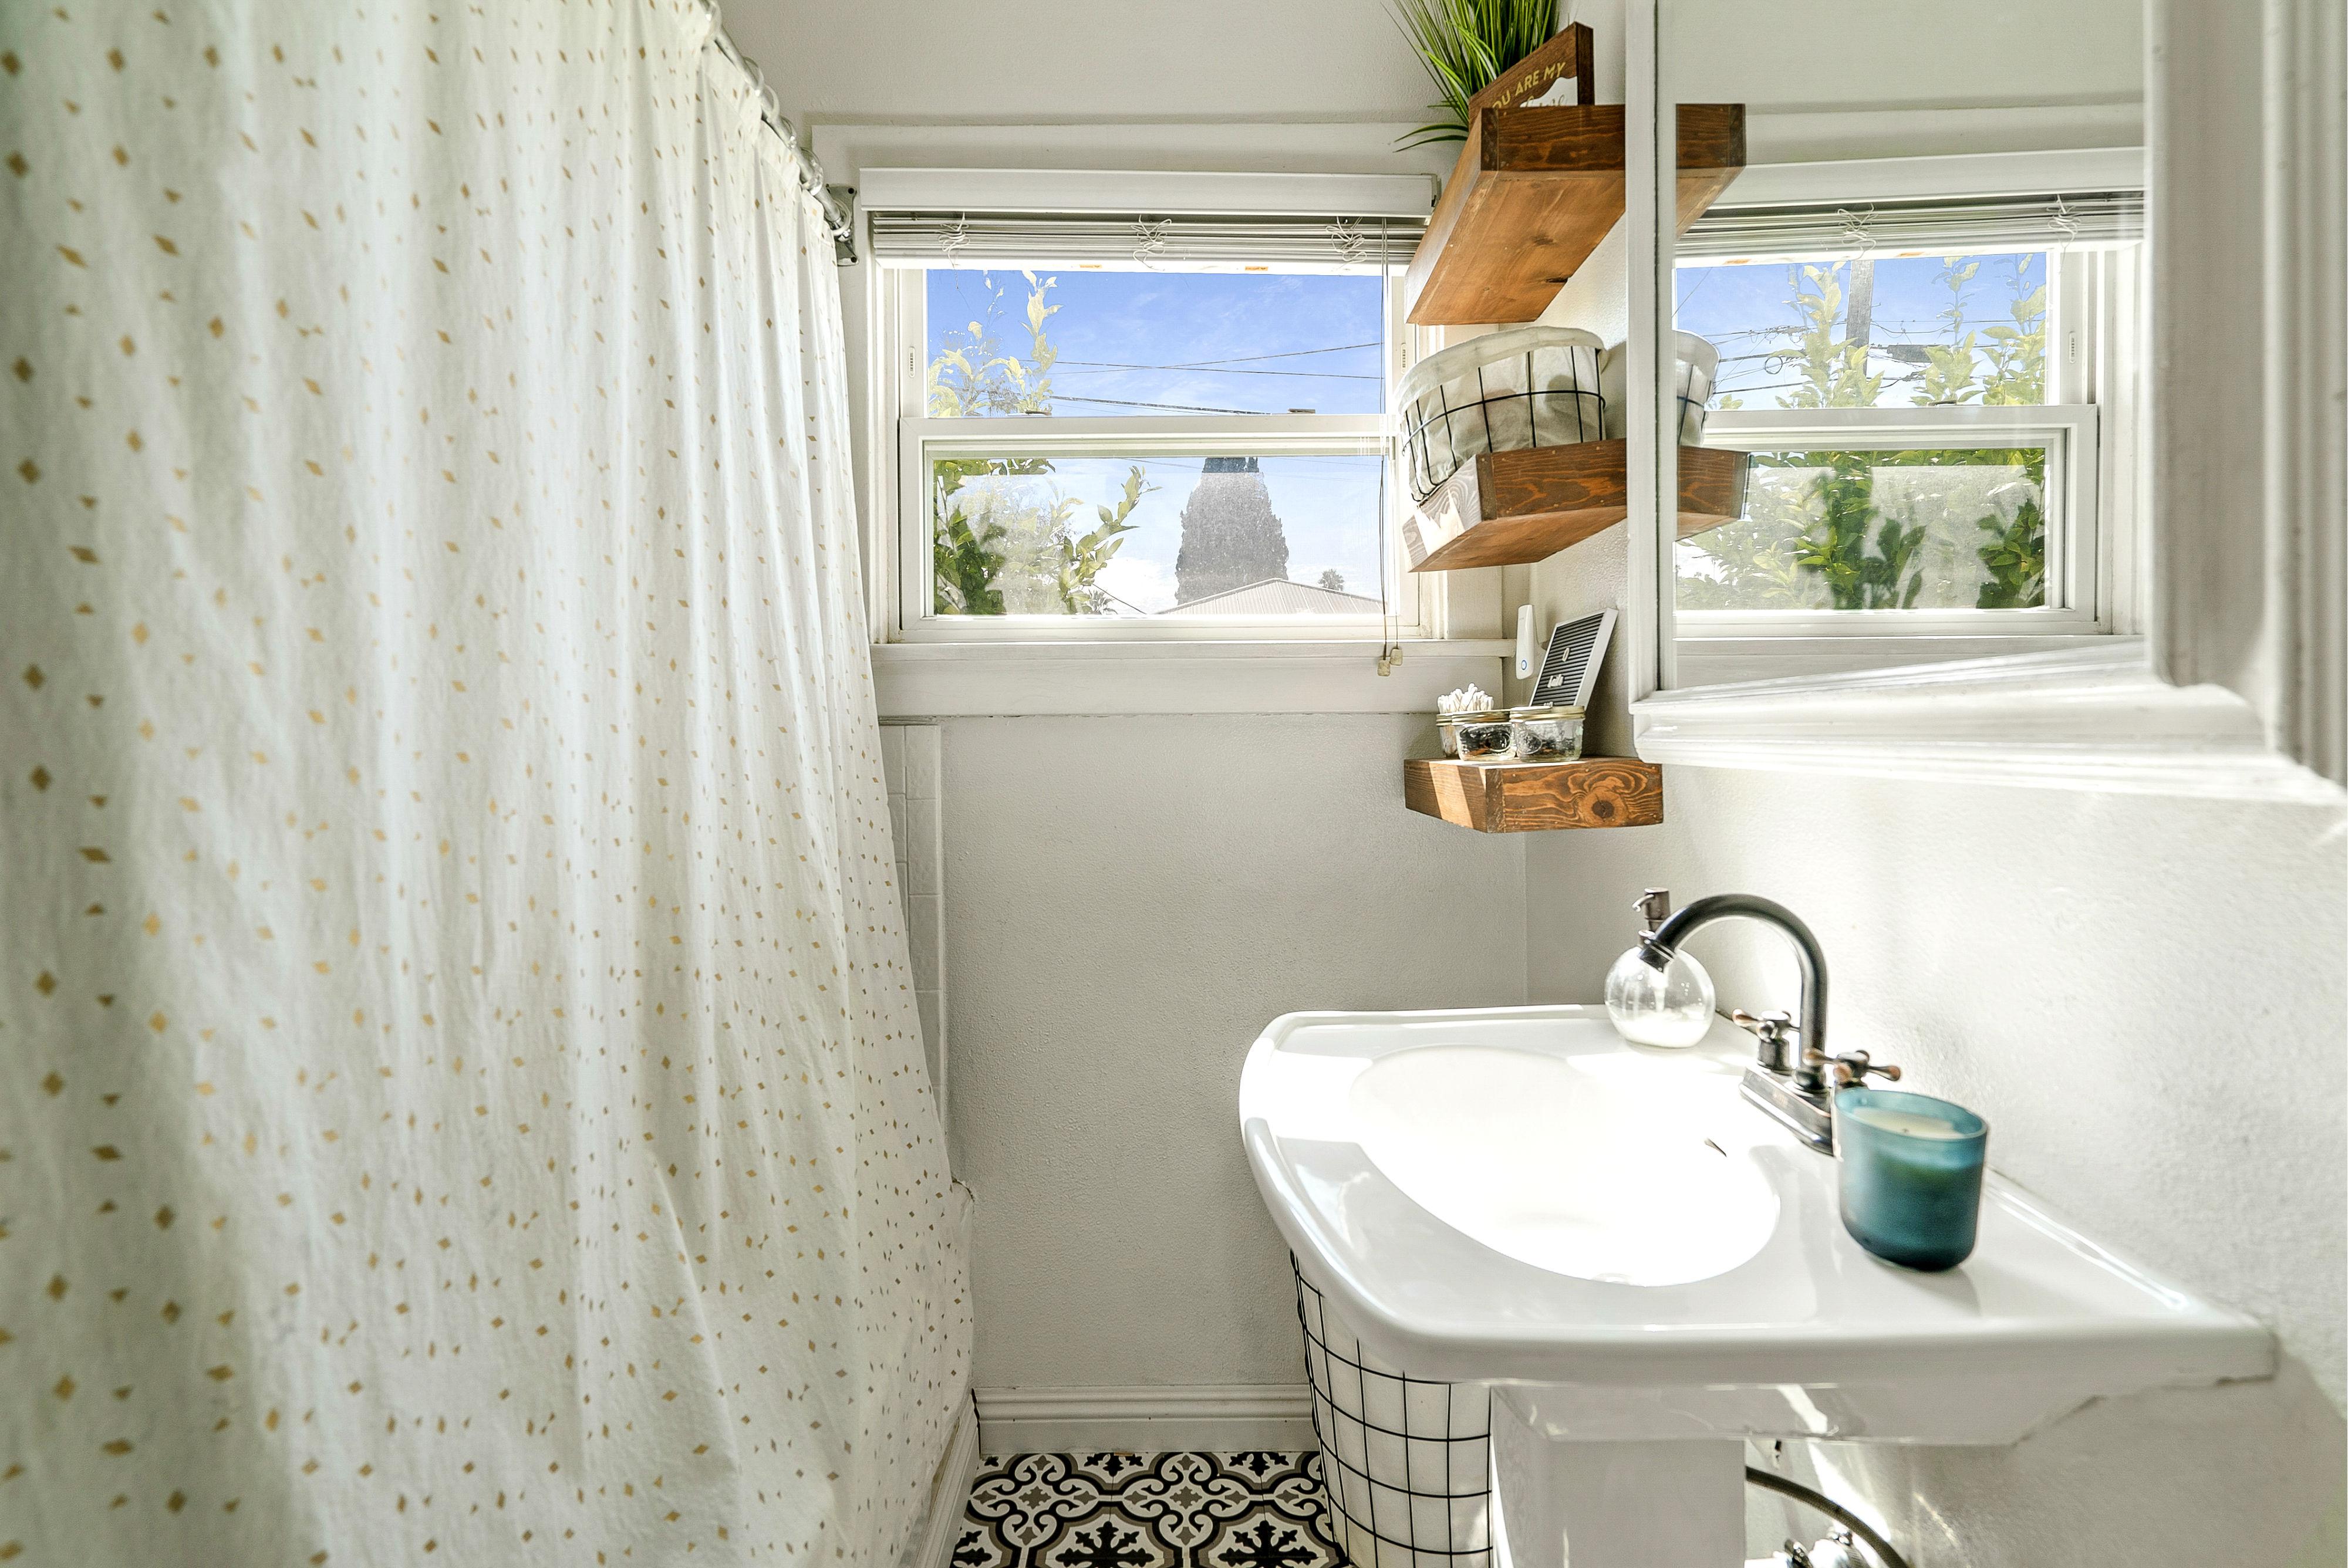 Bathroom with shower in tub, pedestal sink, floating shelves, and newer flooring.